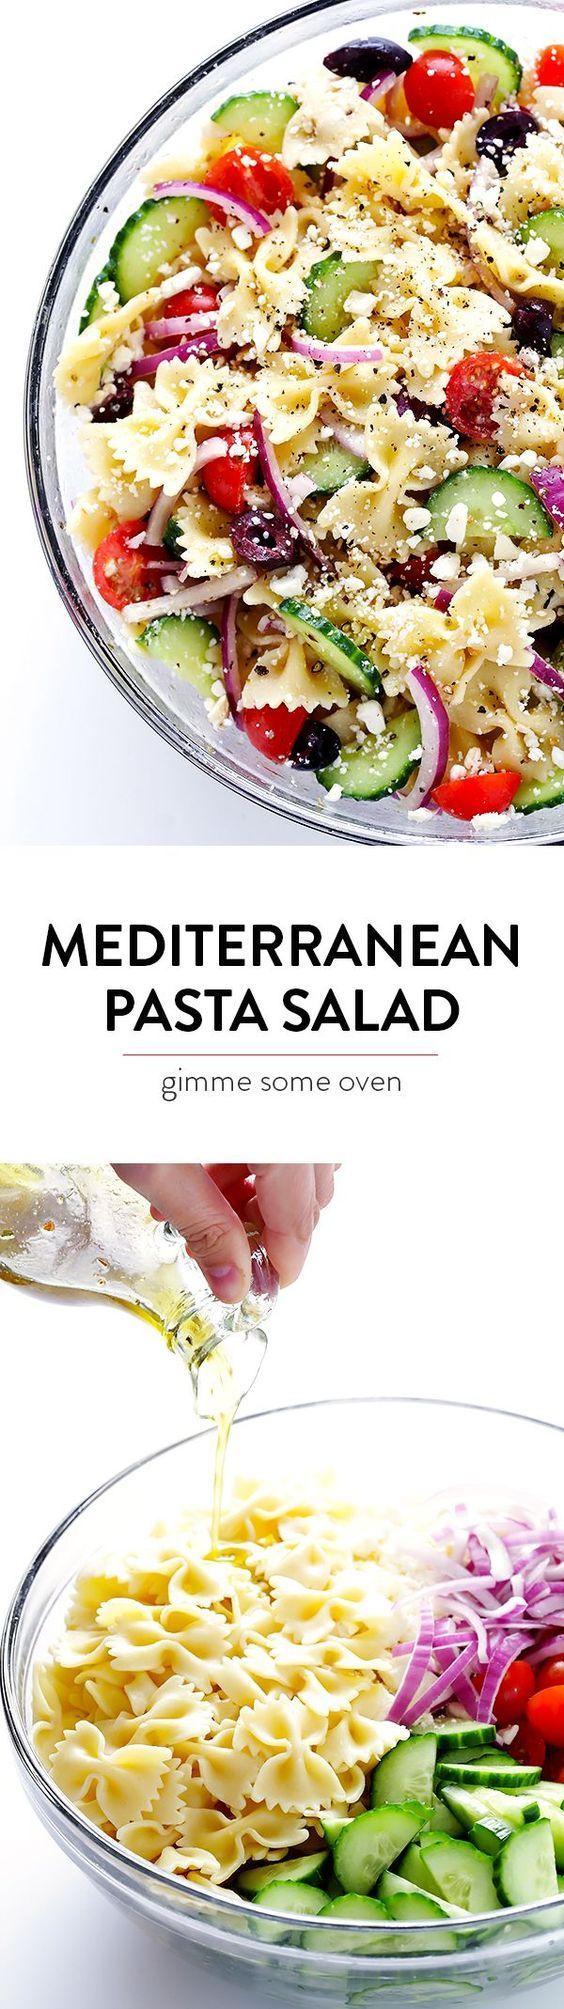 Mediterranean Pasta Salad | Recipe | Mediterranean pasta salads ...